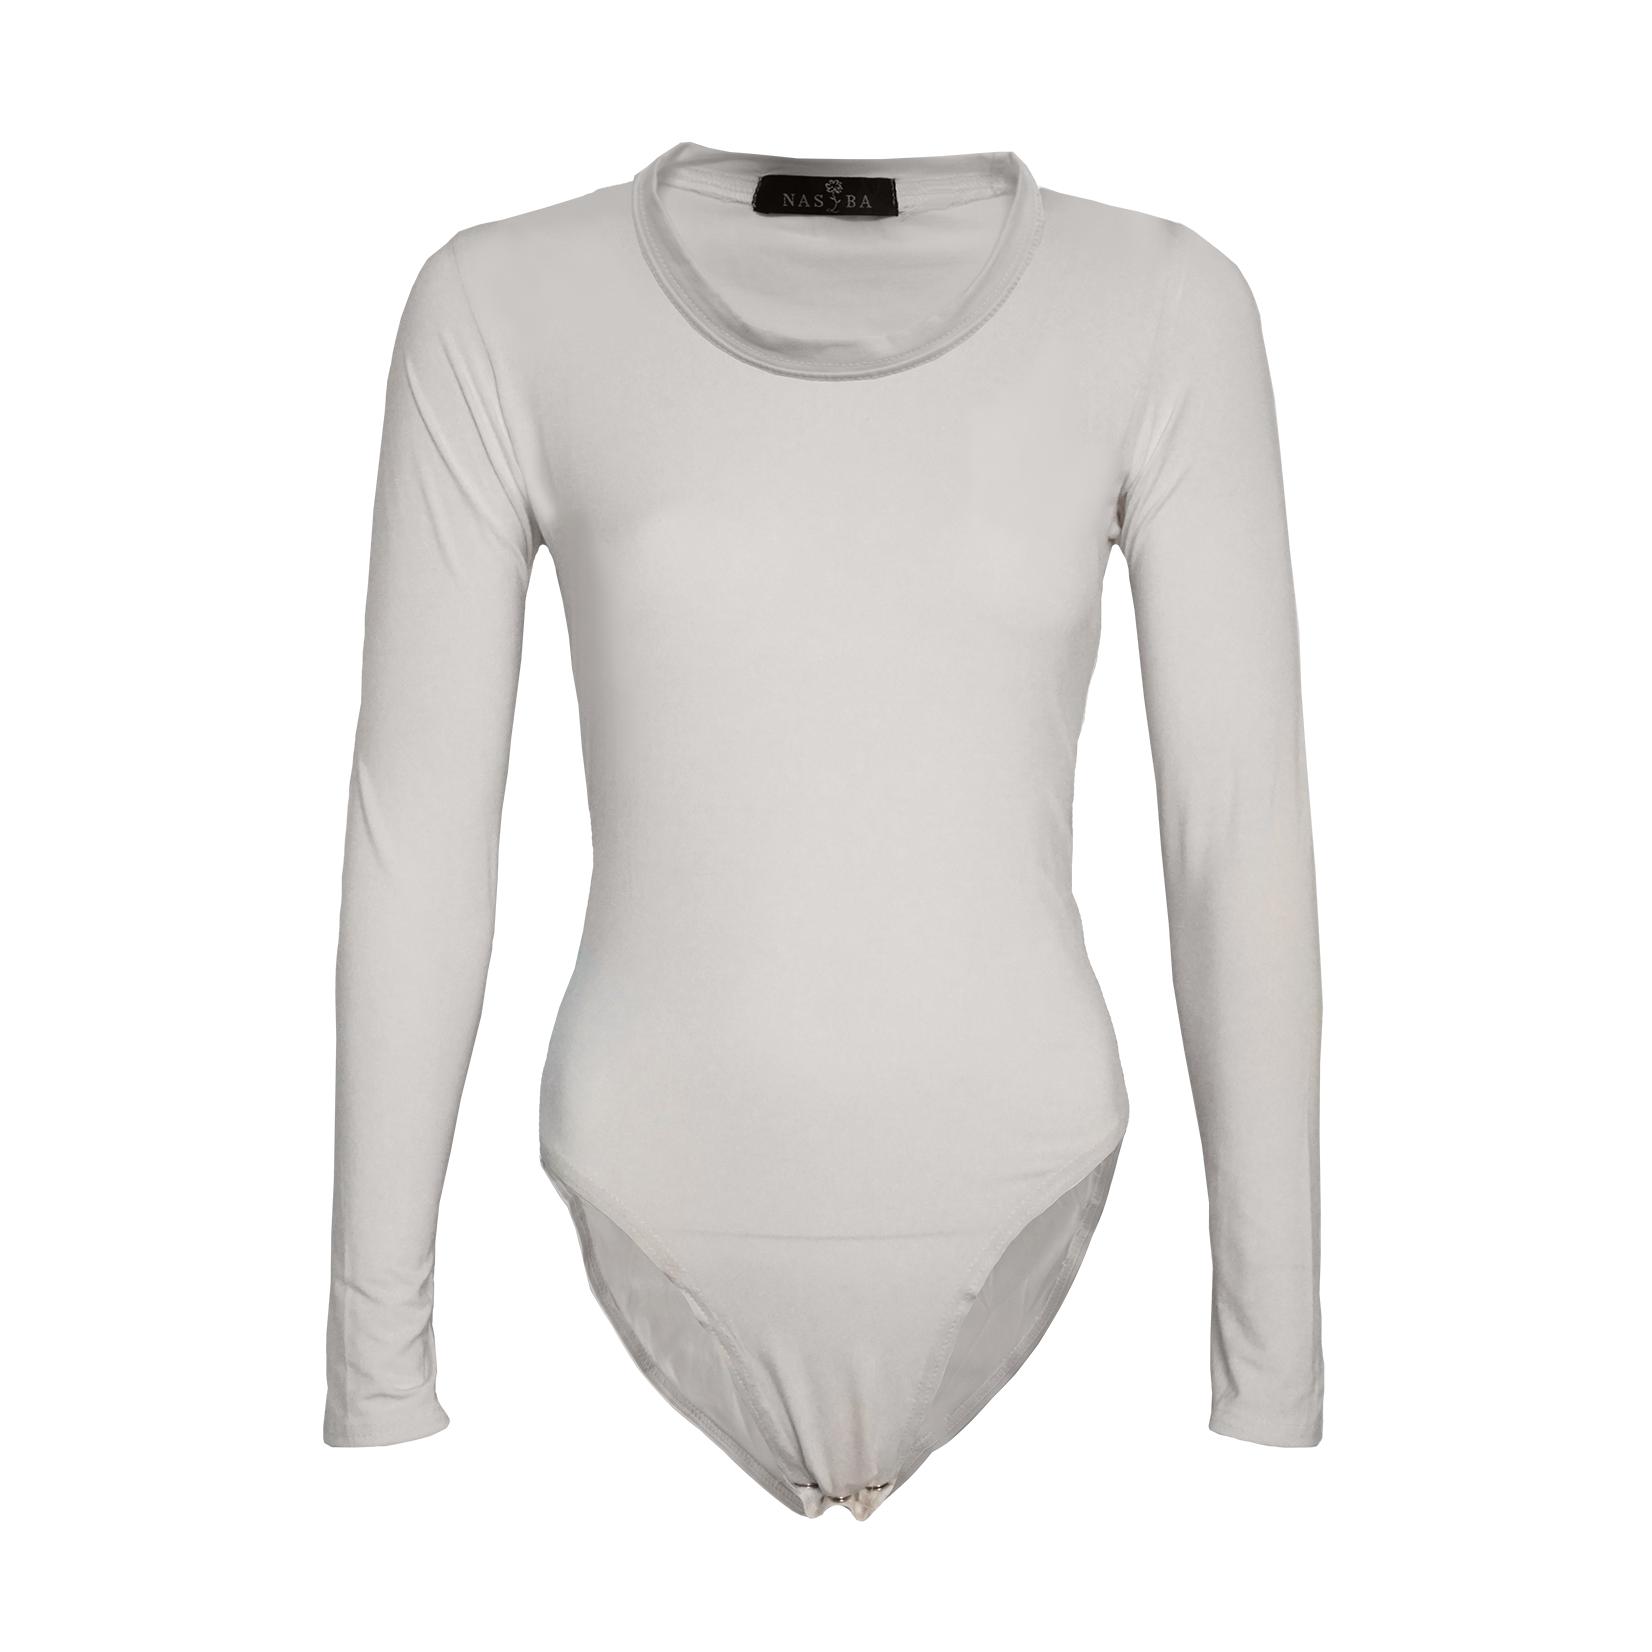 Nasiba Fashion Off-white Jersey Bodysuit